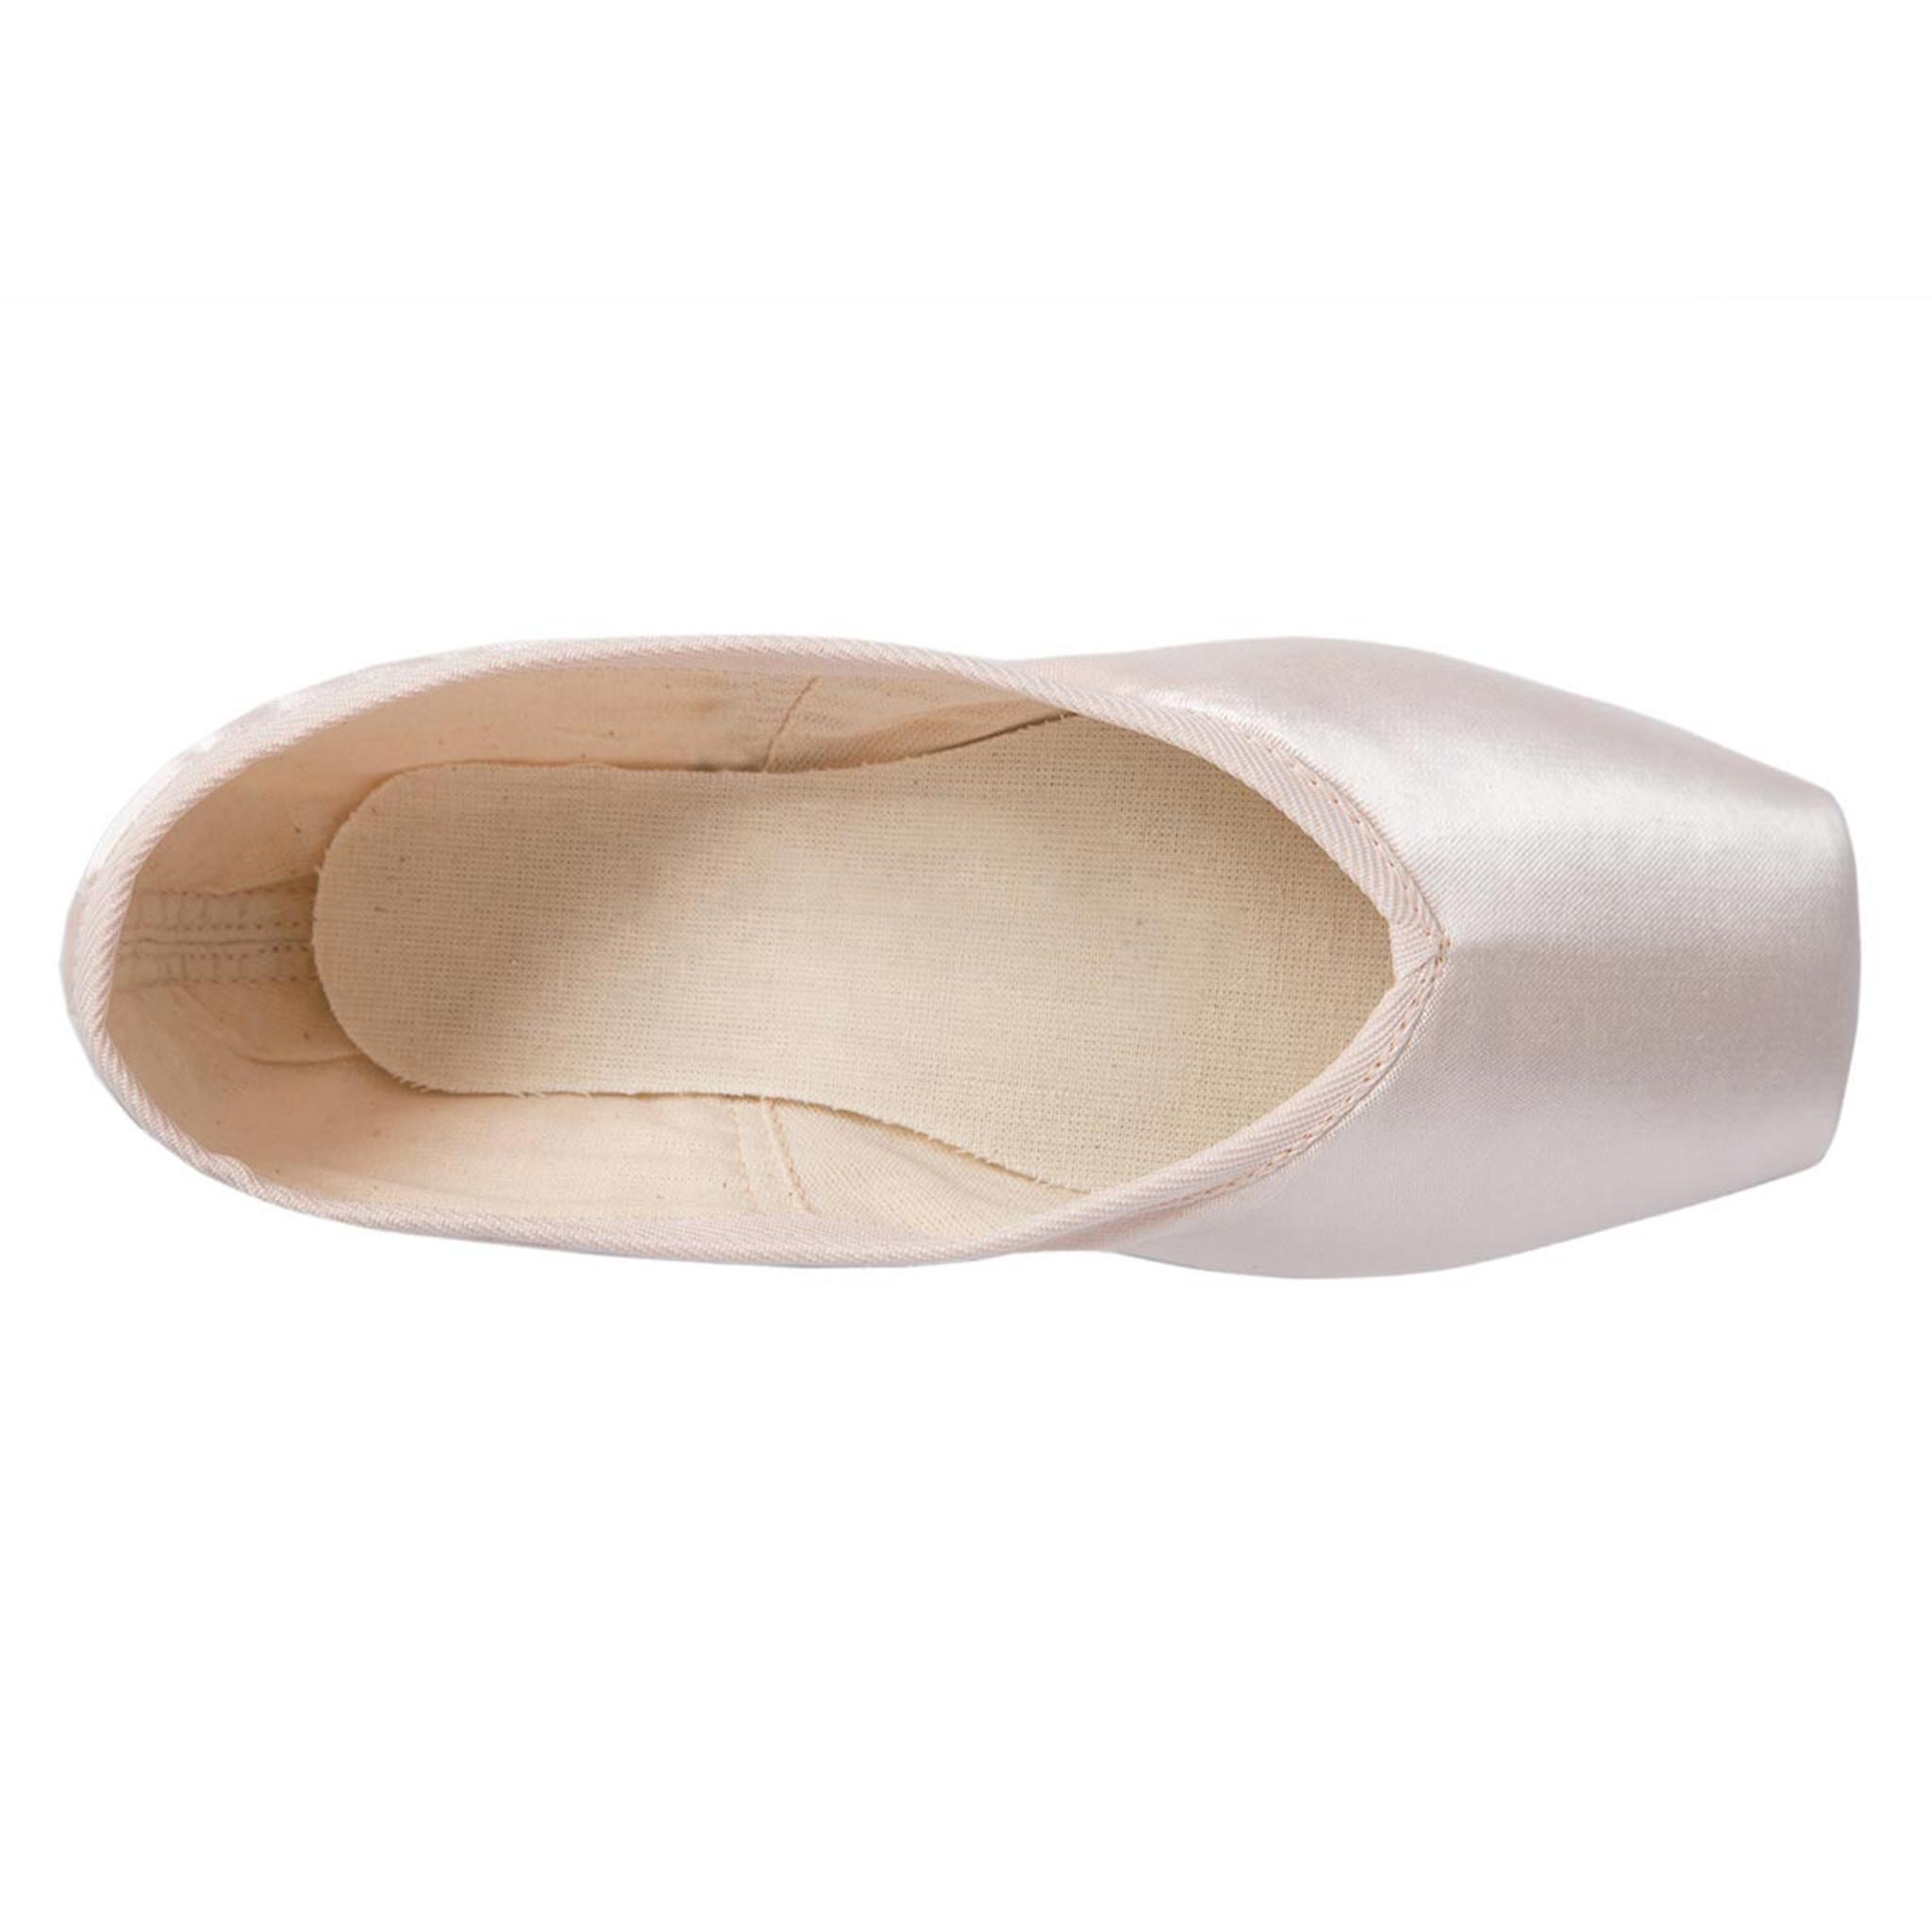 Energetiks Topaz Elite Pointe Shoes